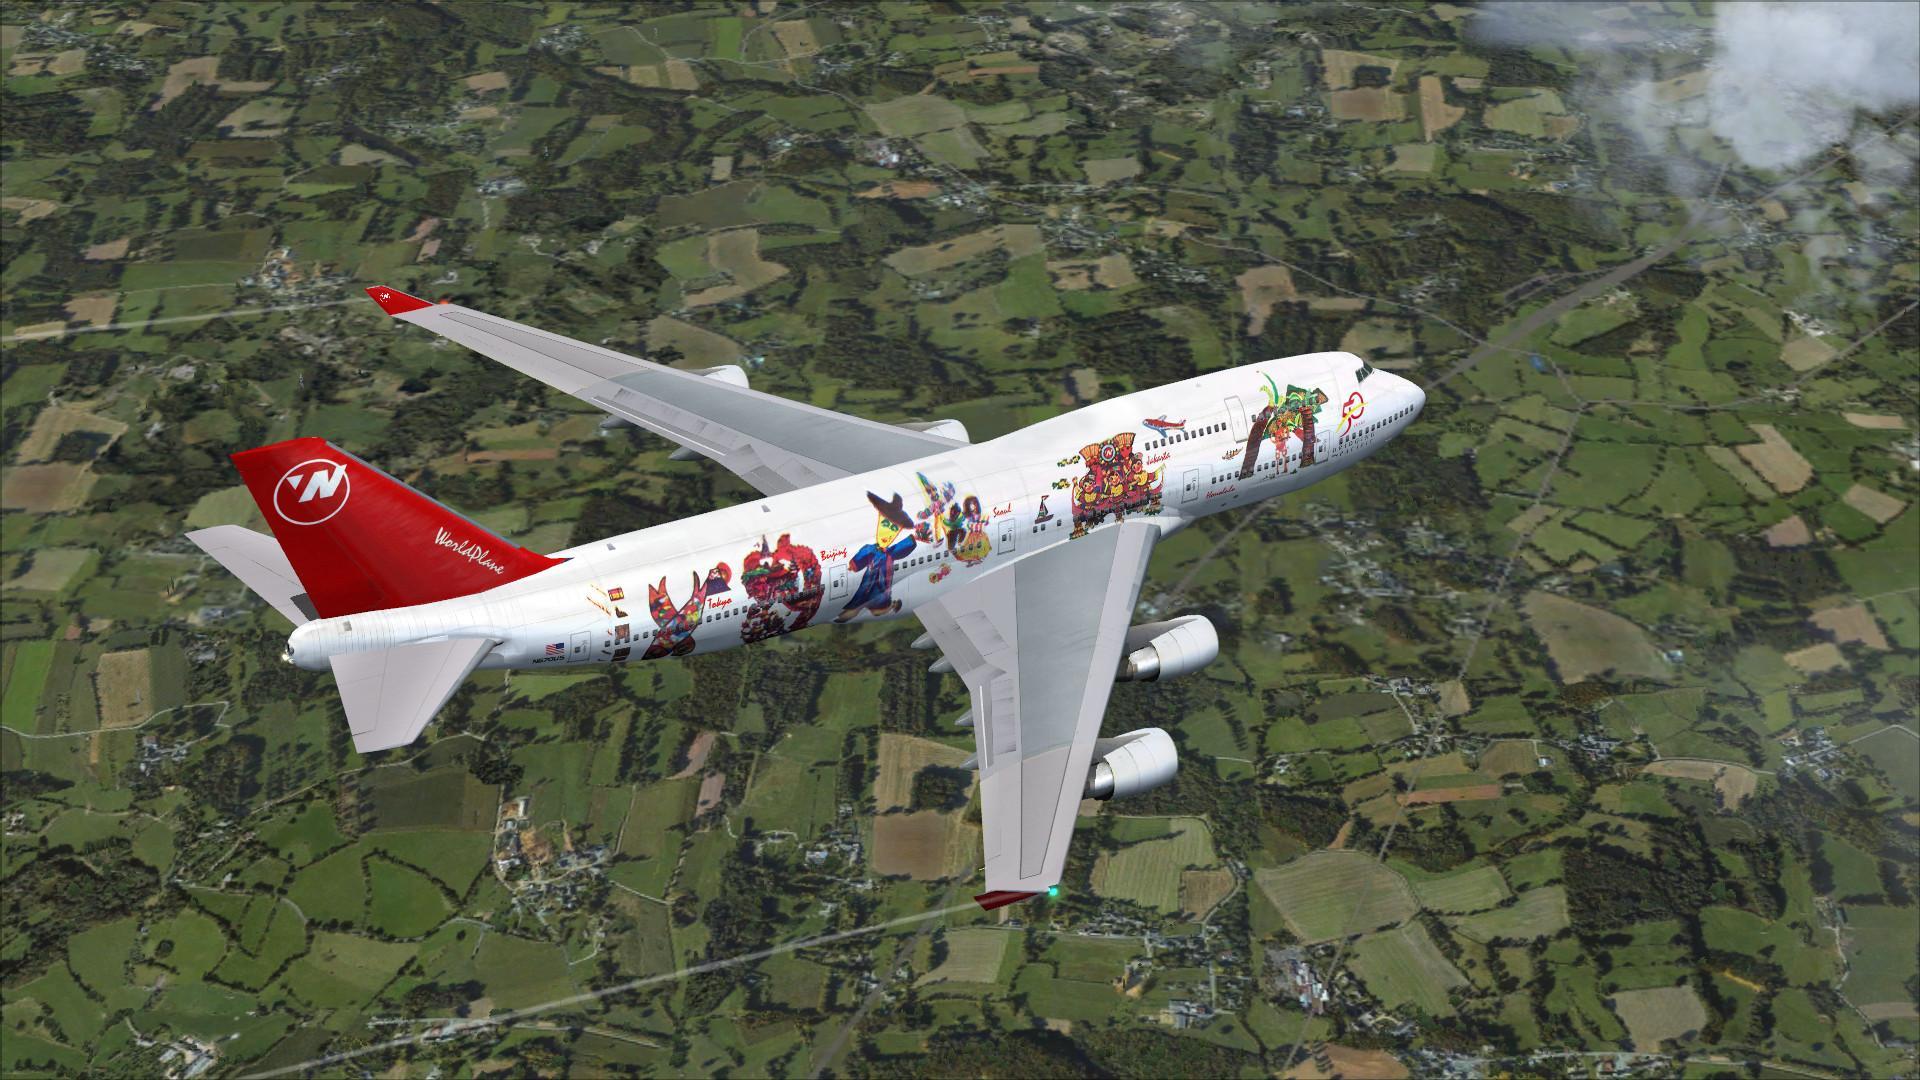 Pmdg 747-400 для fsx скачать